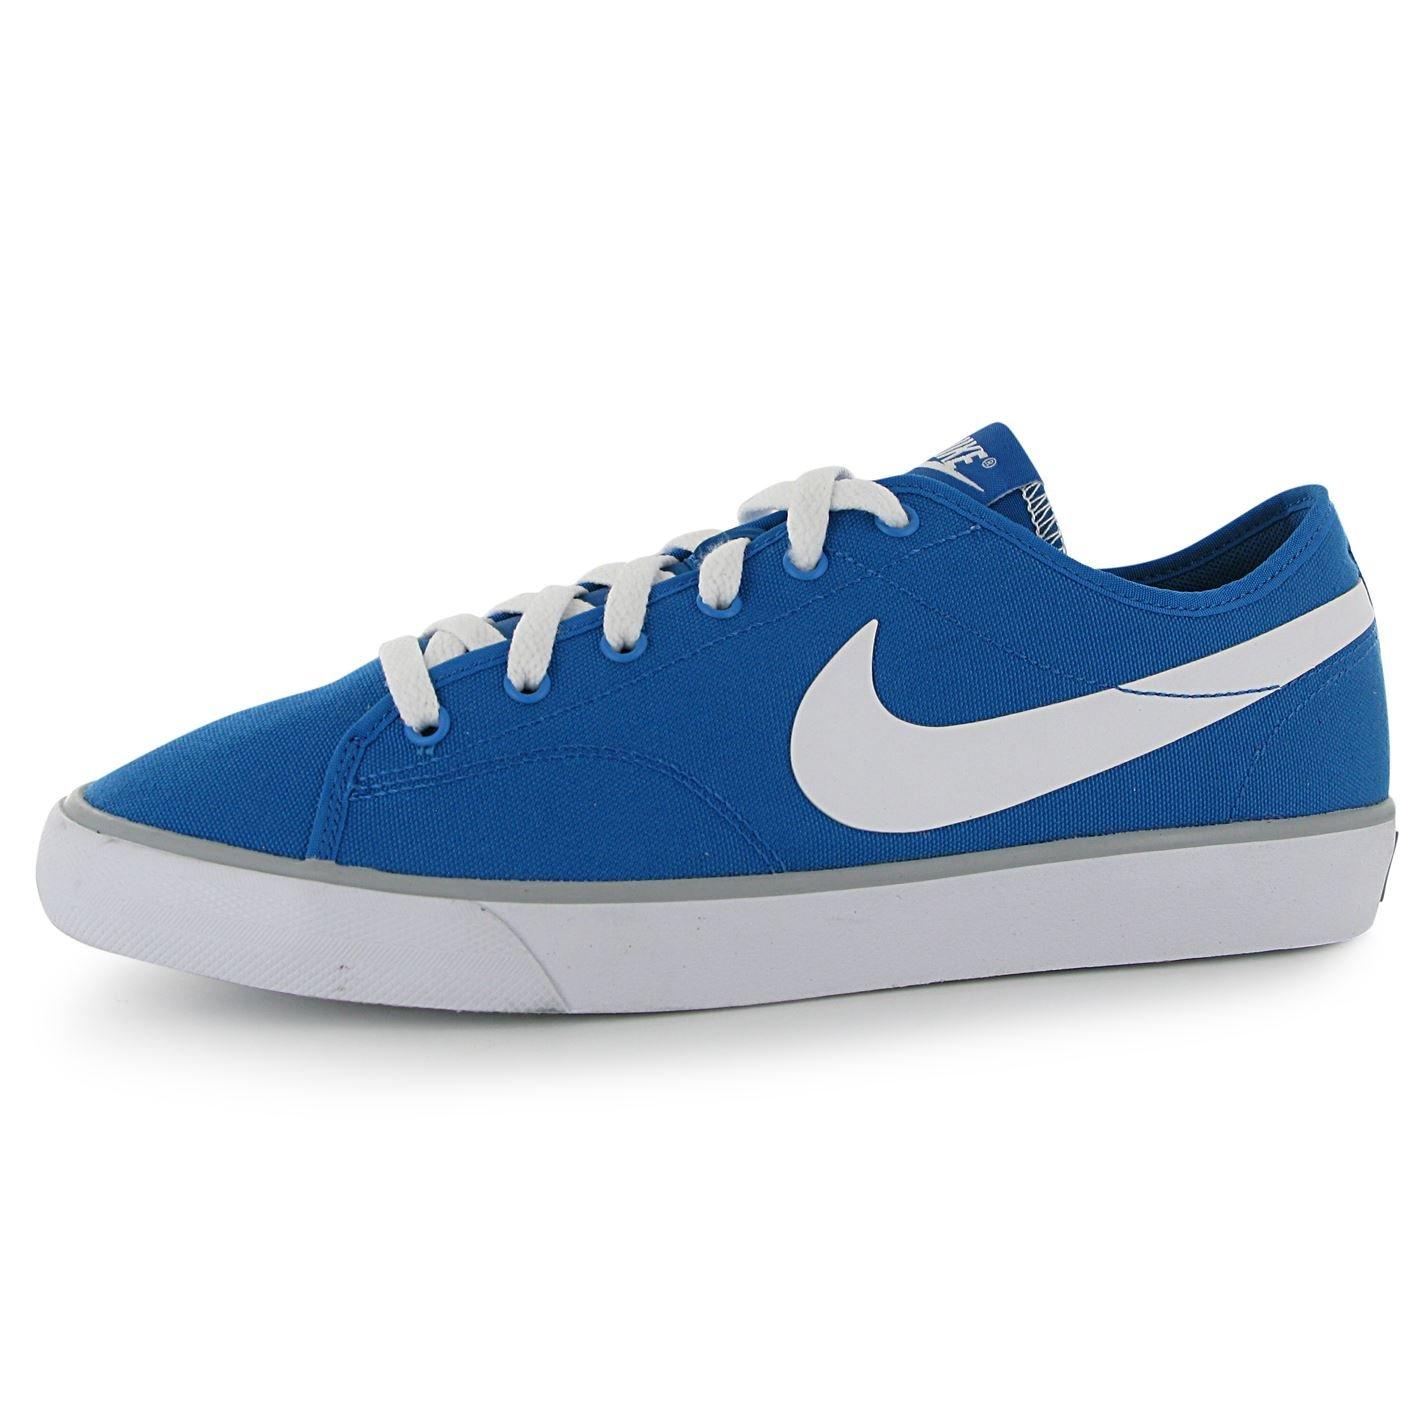 Nike Primo Court Court Court Laufschuhe 631691 411 e945a9